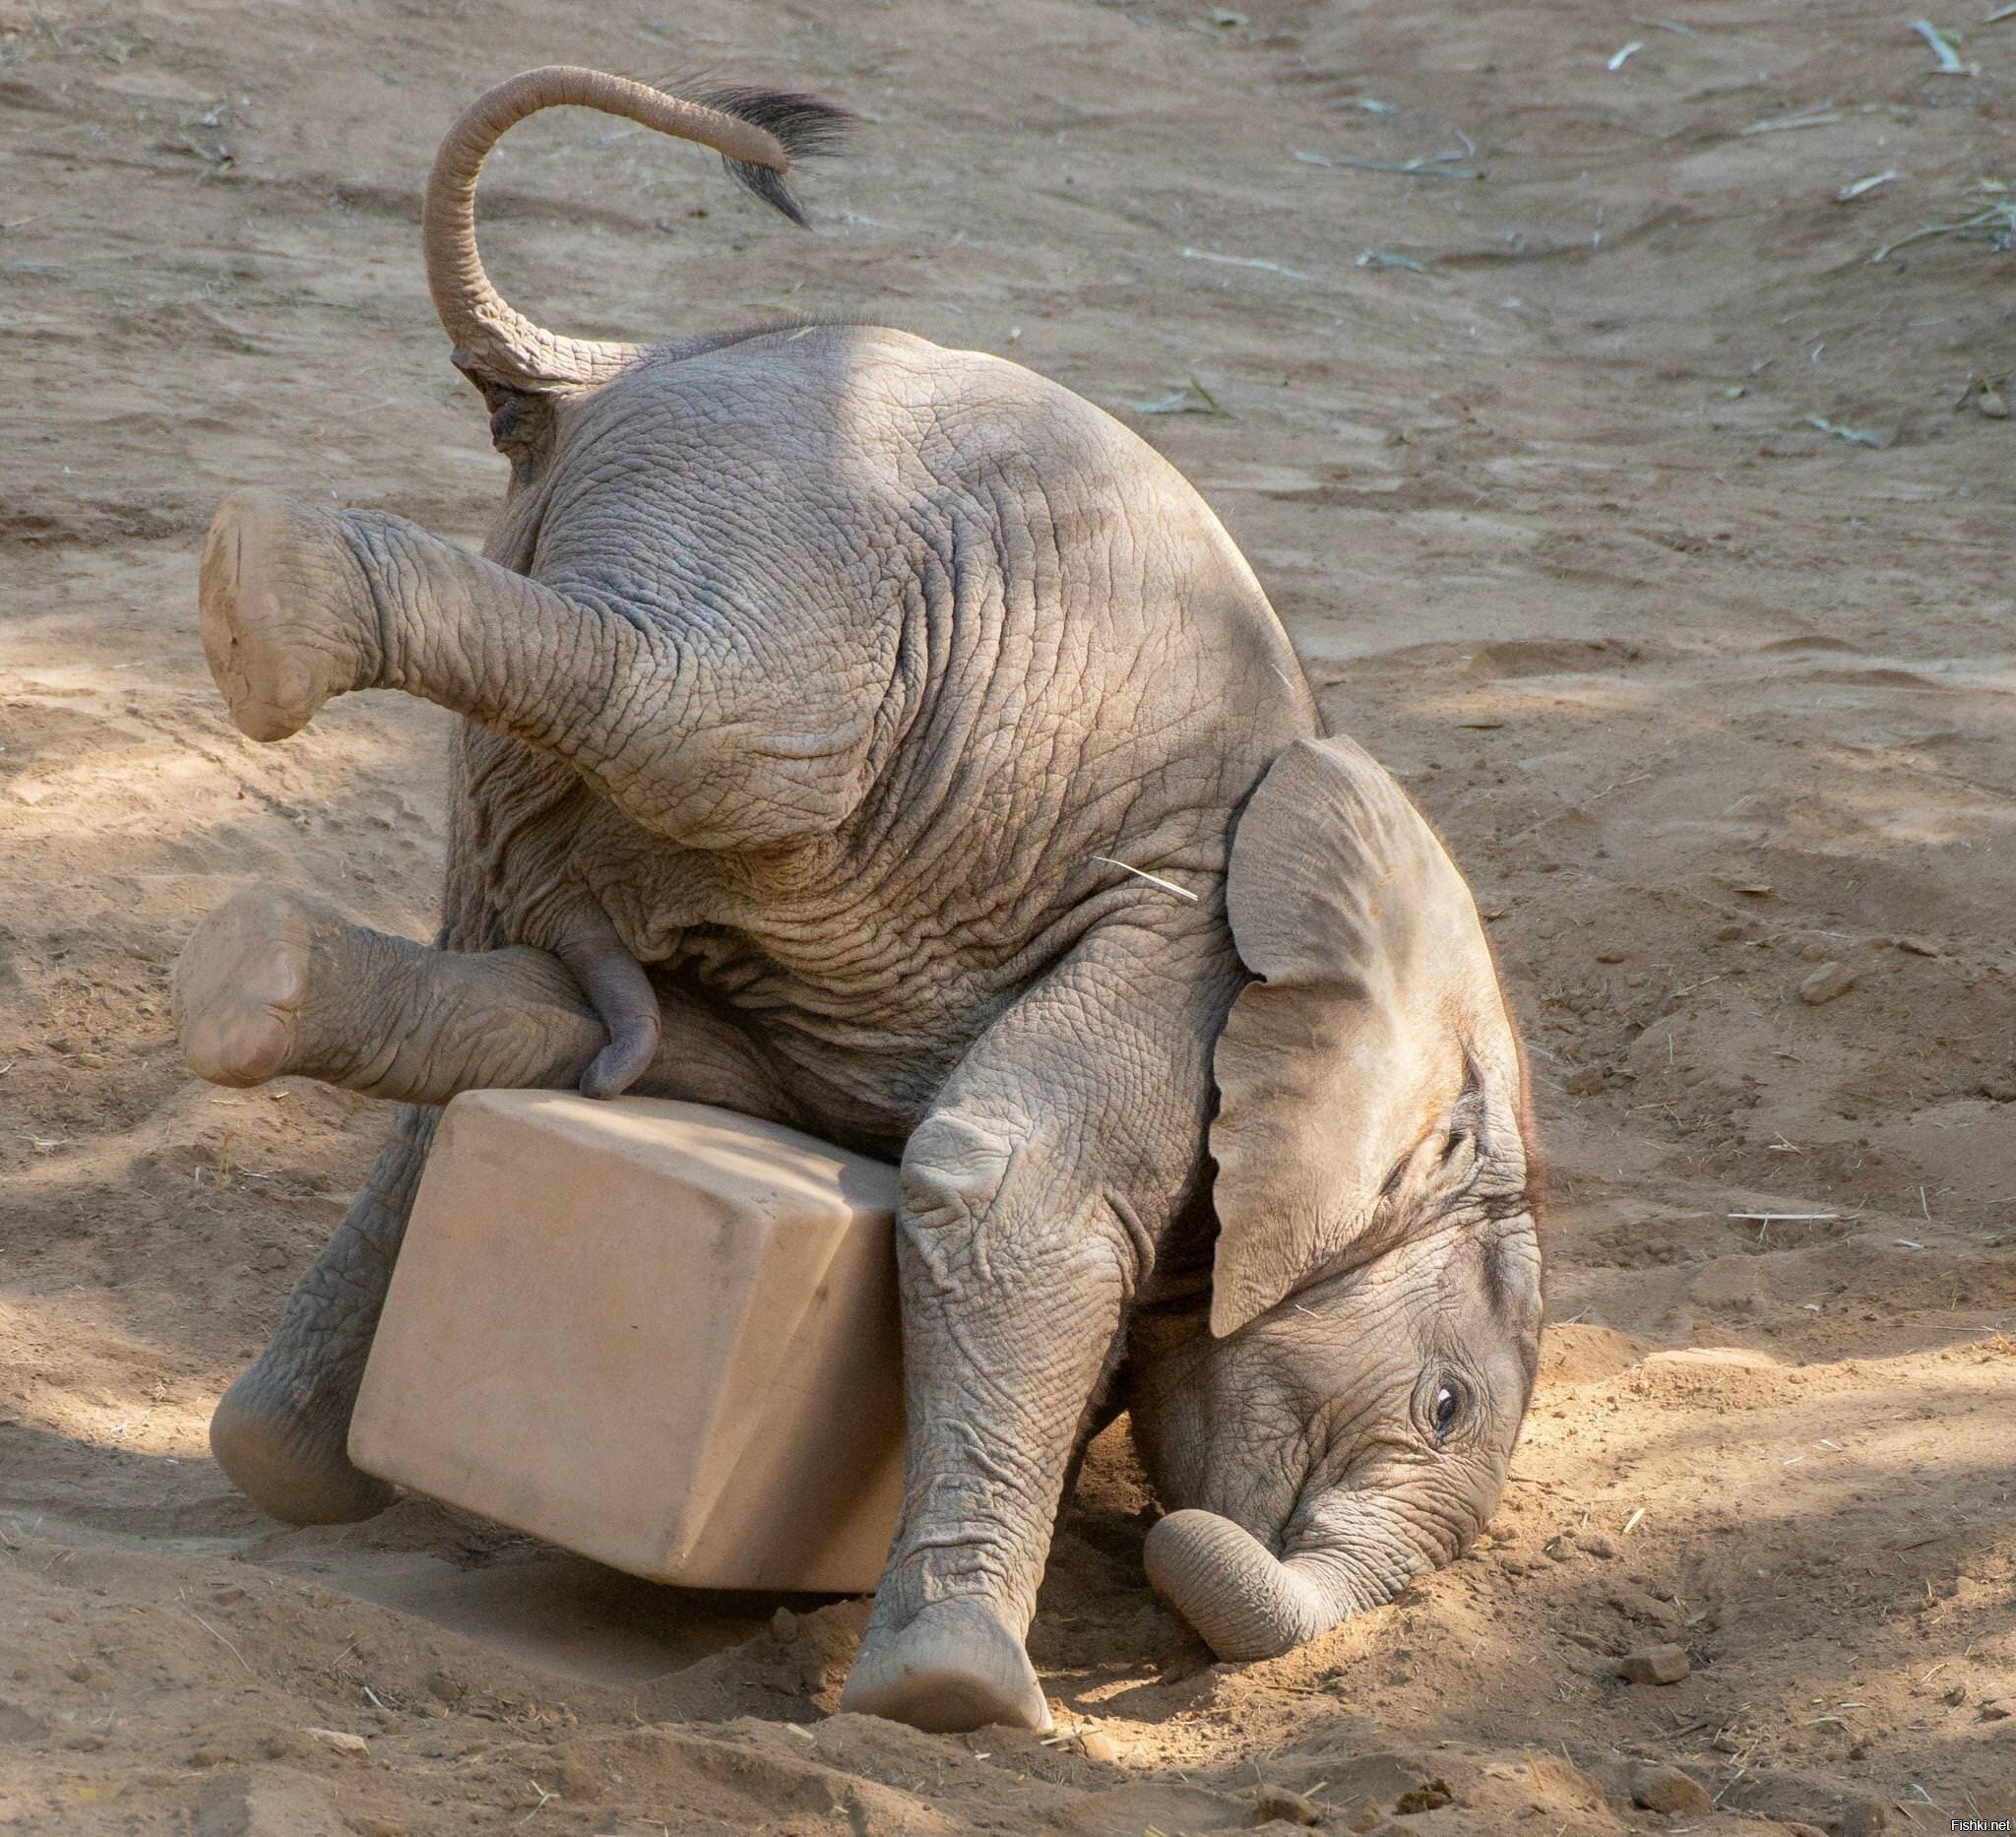 Картинки со слоненком доброе утро, картинки среда открытка